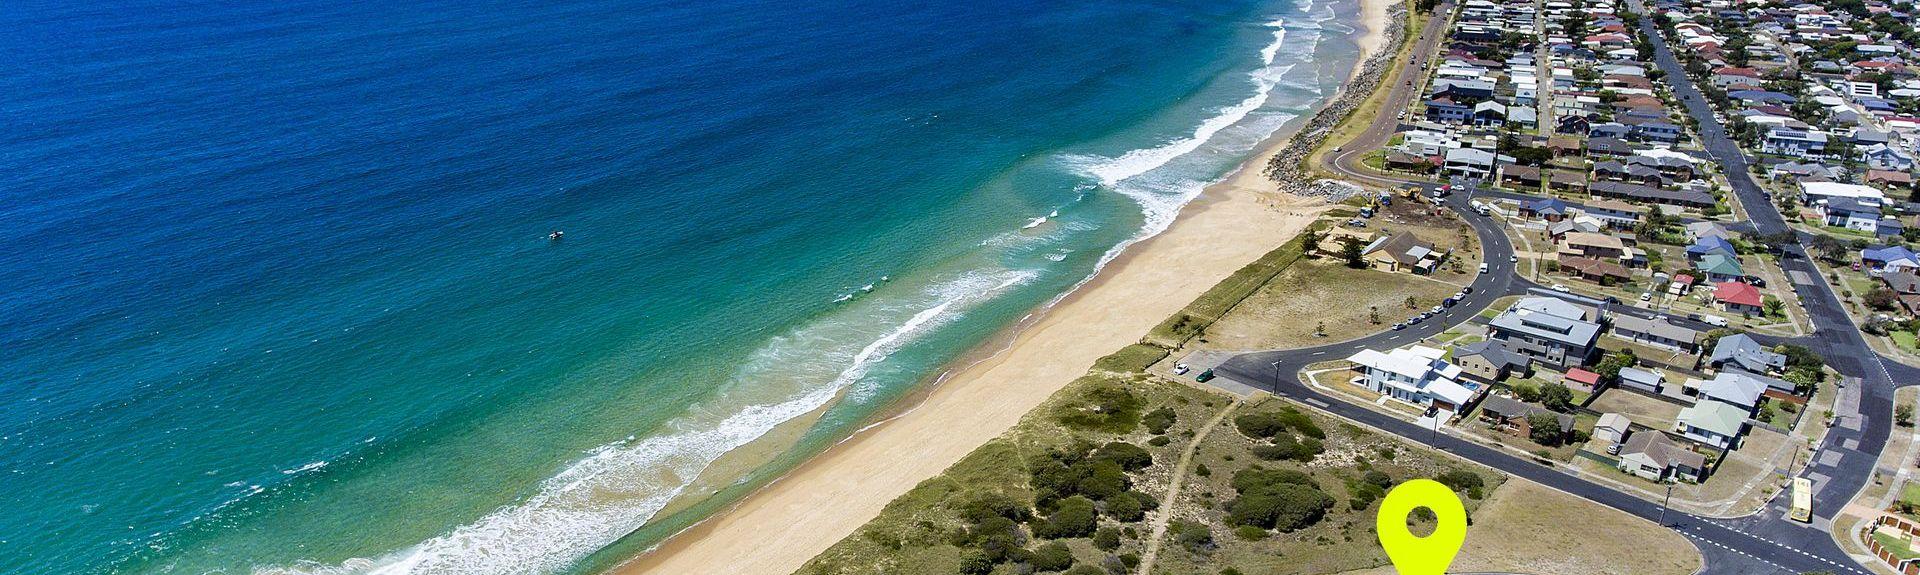 Merewether NSW, Australia